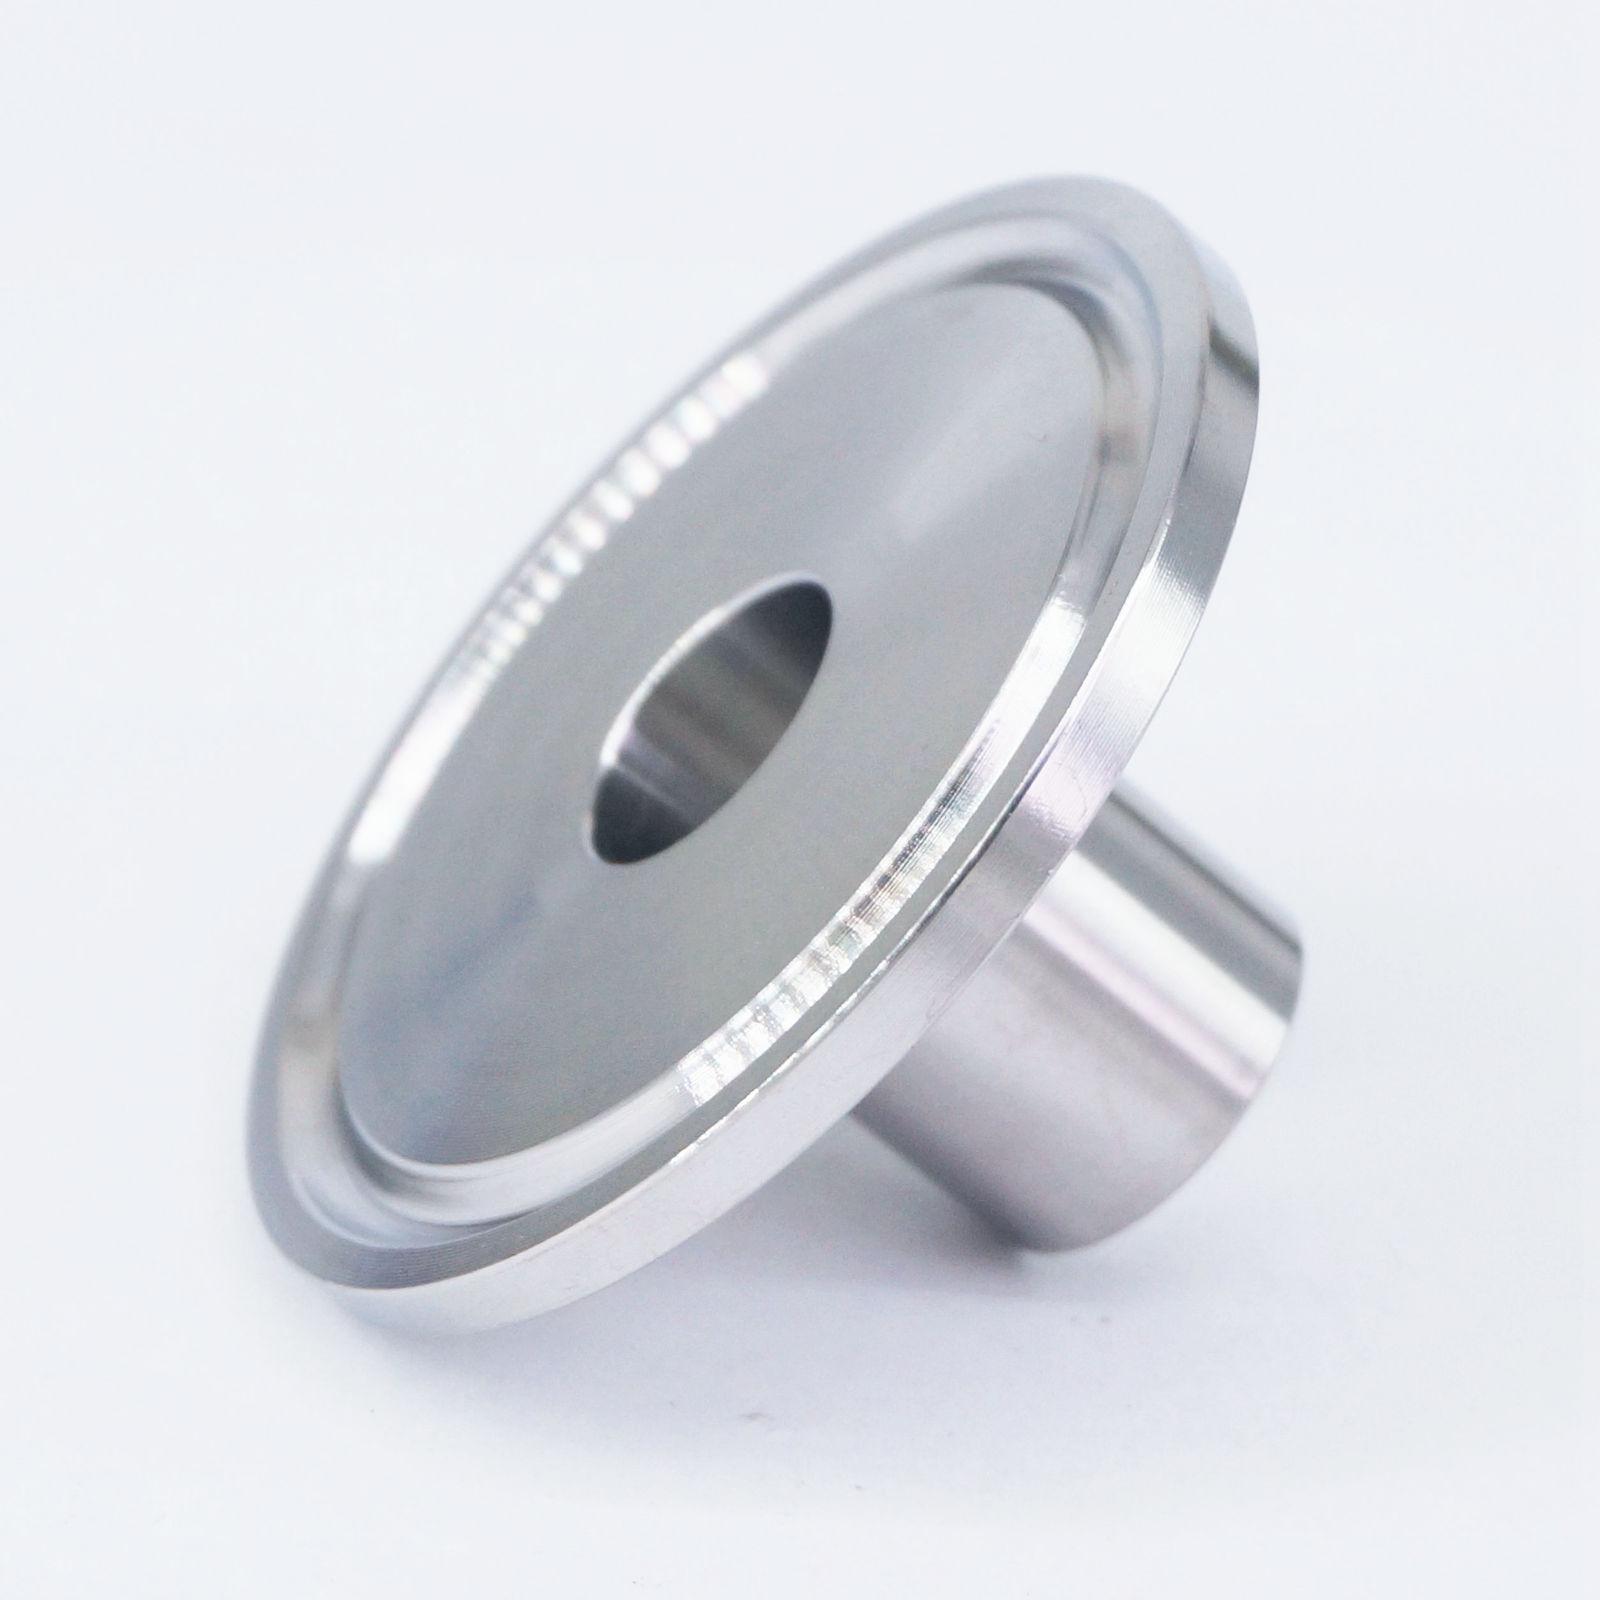 1/4 bsp Weibliche X 50,5mm Ferrule O/d 304 Edelstahl Sanitär Ferrule Rohrschelle Montage Anschluss Rohre & Armaturen